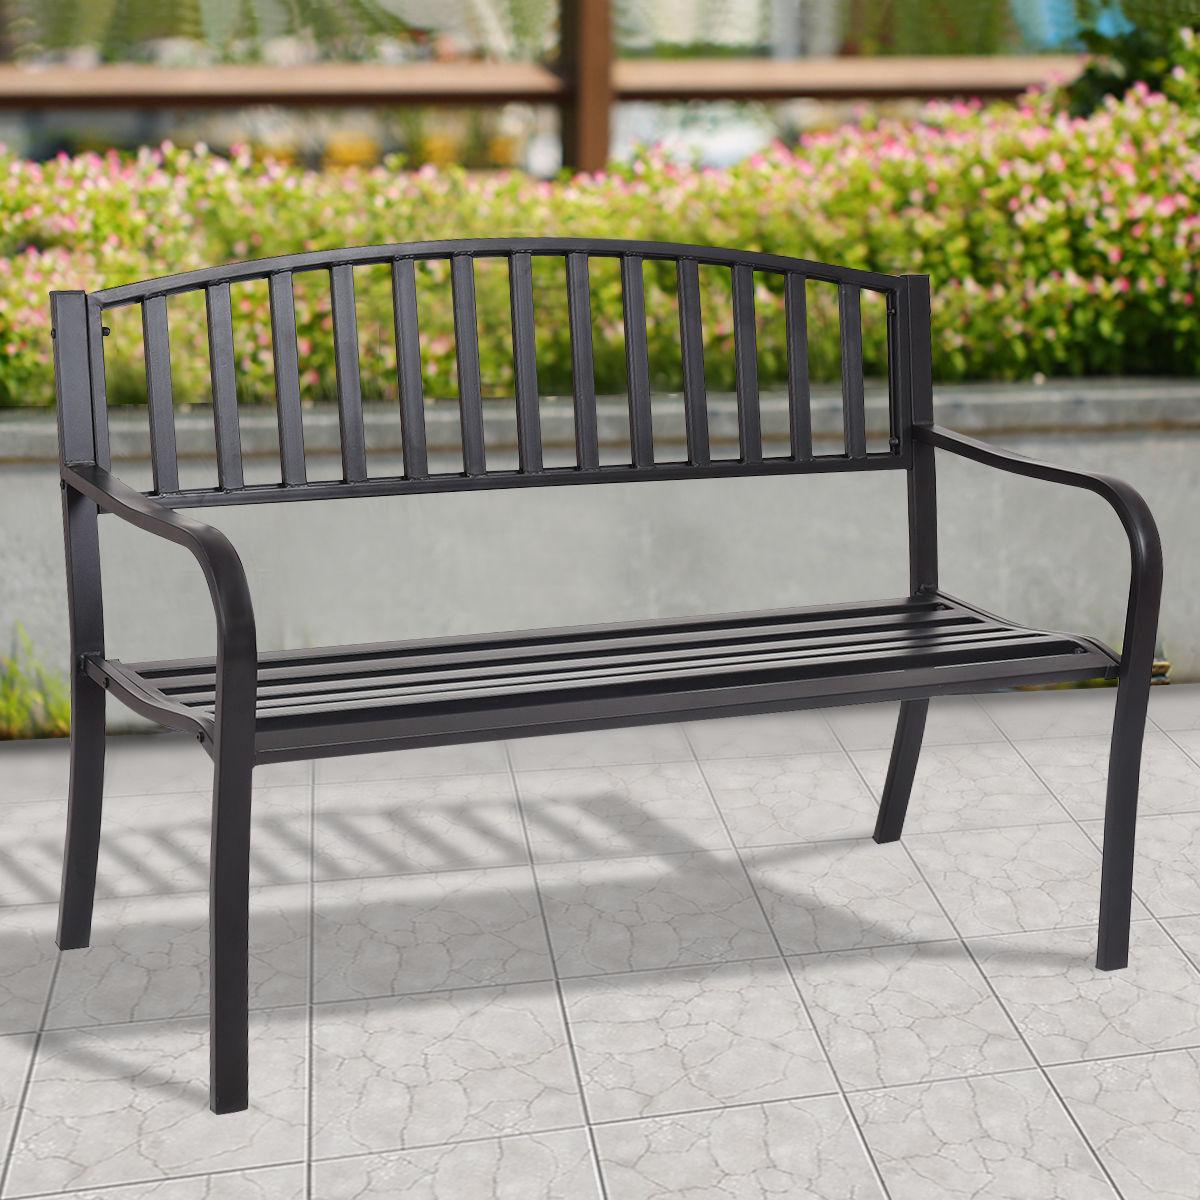 Costway 50'' Patio Garden Bench Park Yard Outdoor Furniture Steel Slats Porch Chair Seat – Walmart Inside Michelle Metal Garden Benches (View 8 of 25)